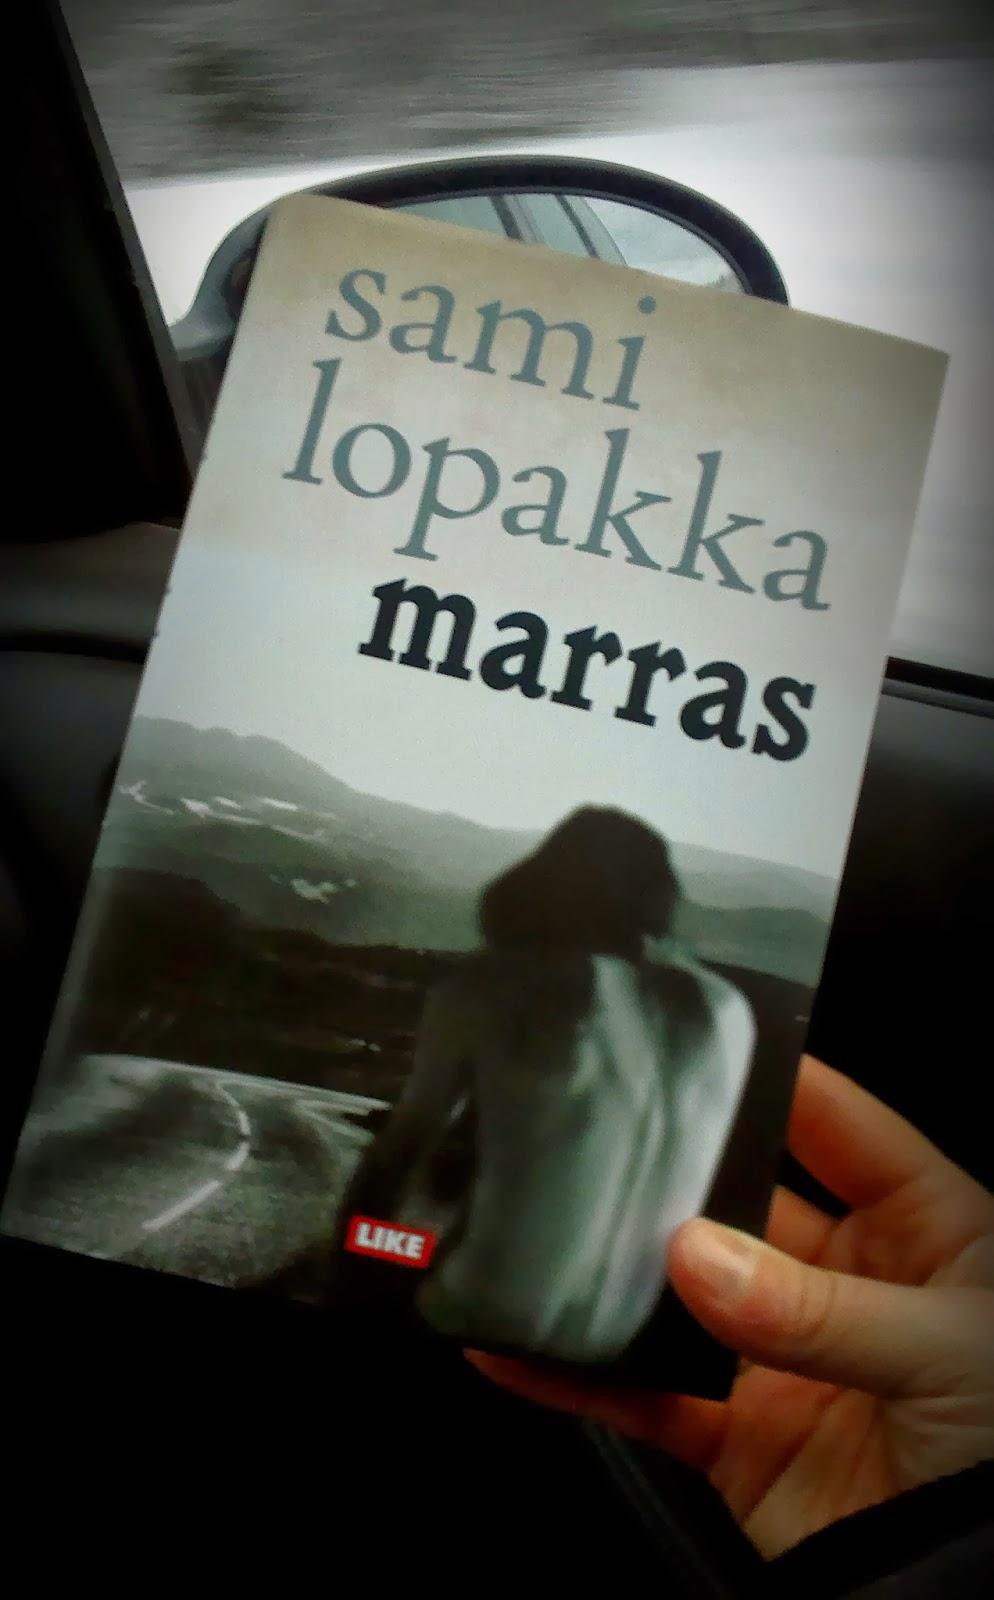 Sami Lopakka Marras